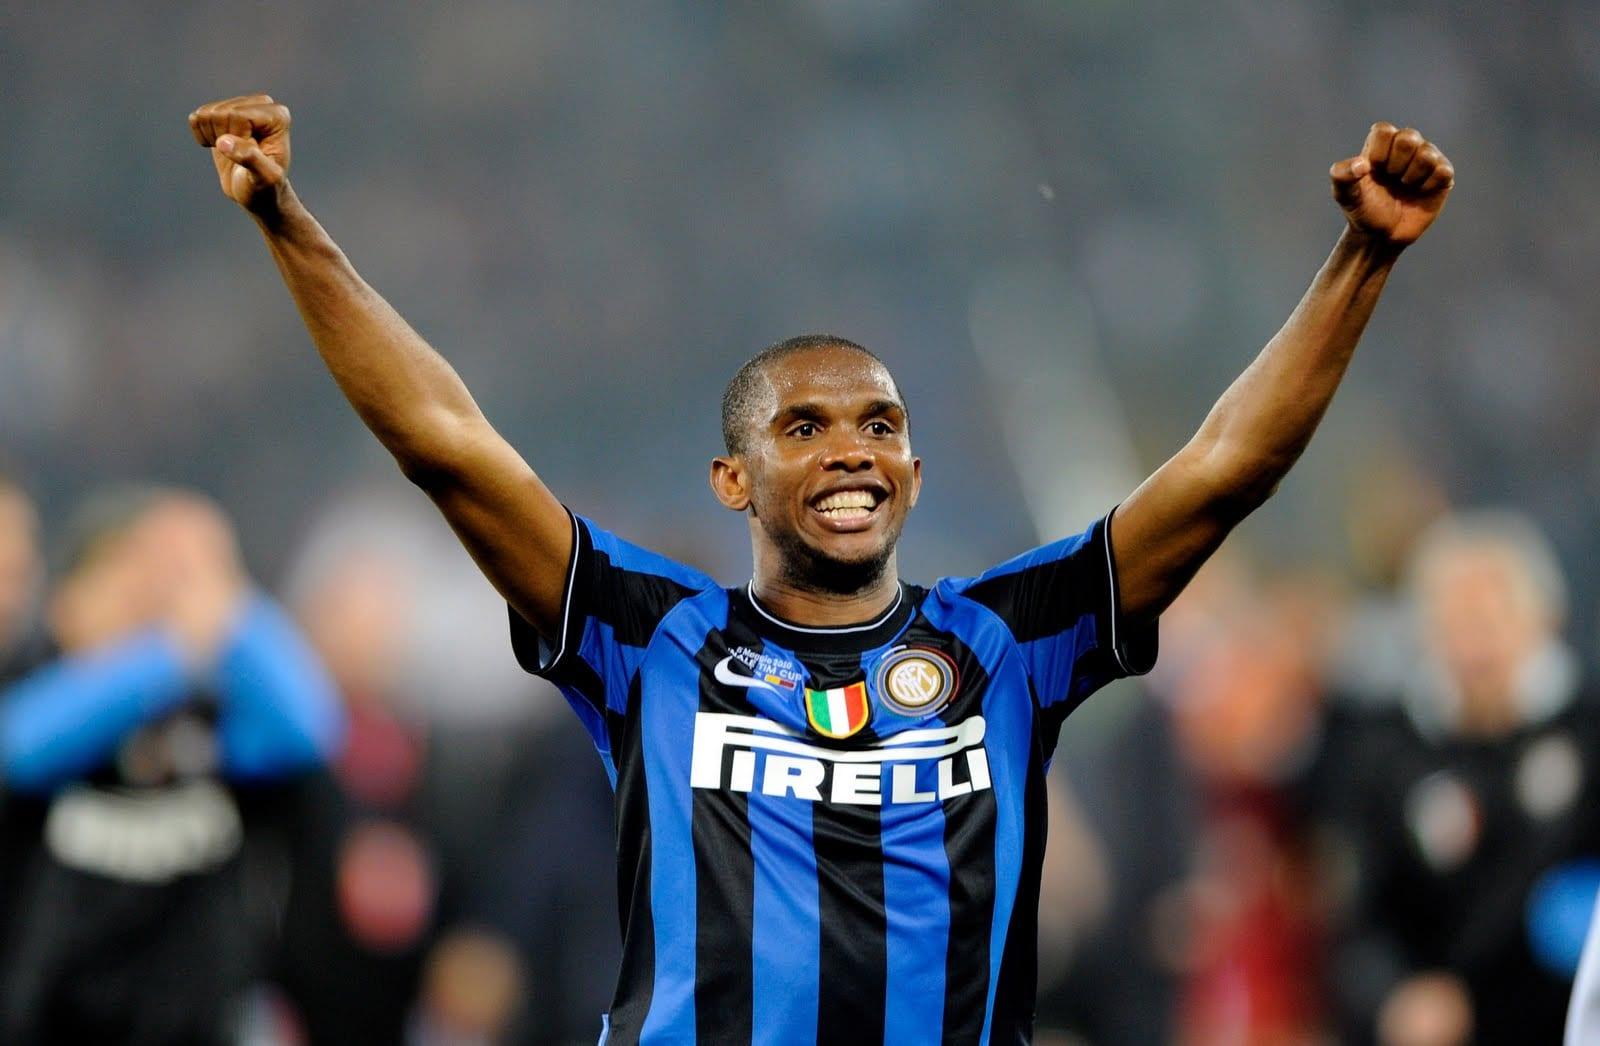 Football Samuel Eto o Wants To Train This Great Italian Club